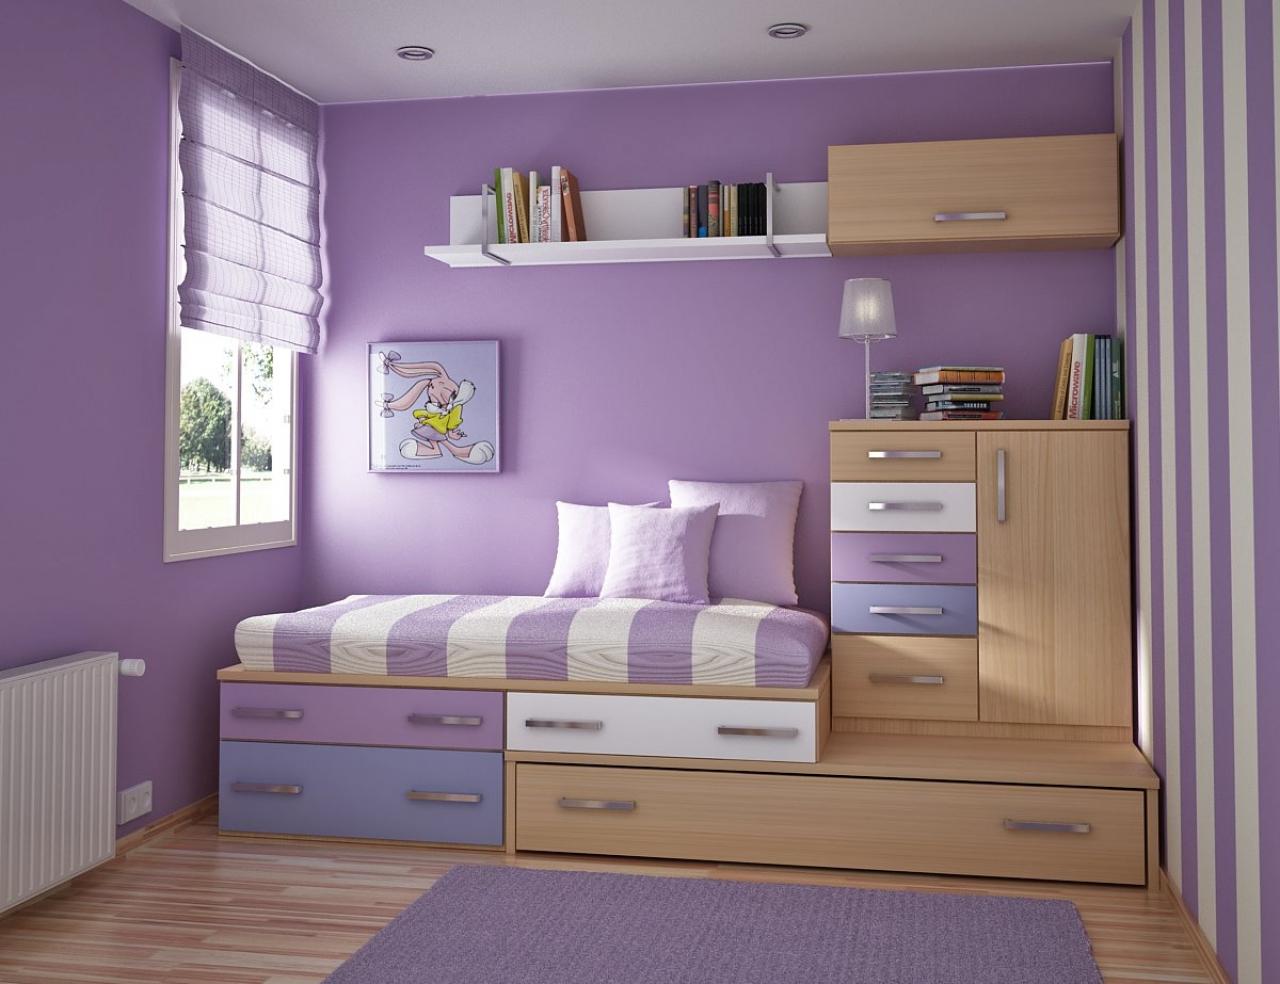 Kids bedroom decorating modern kids bedroom decorating wallpaper 1280x984